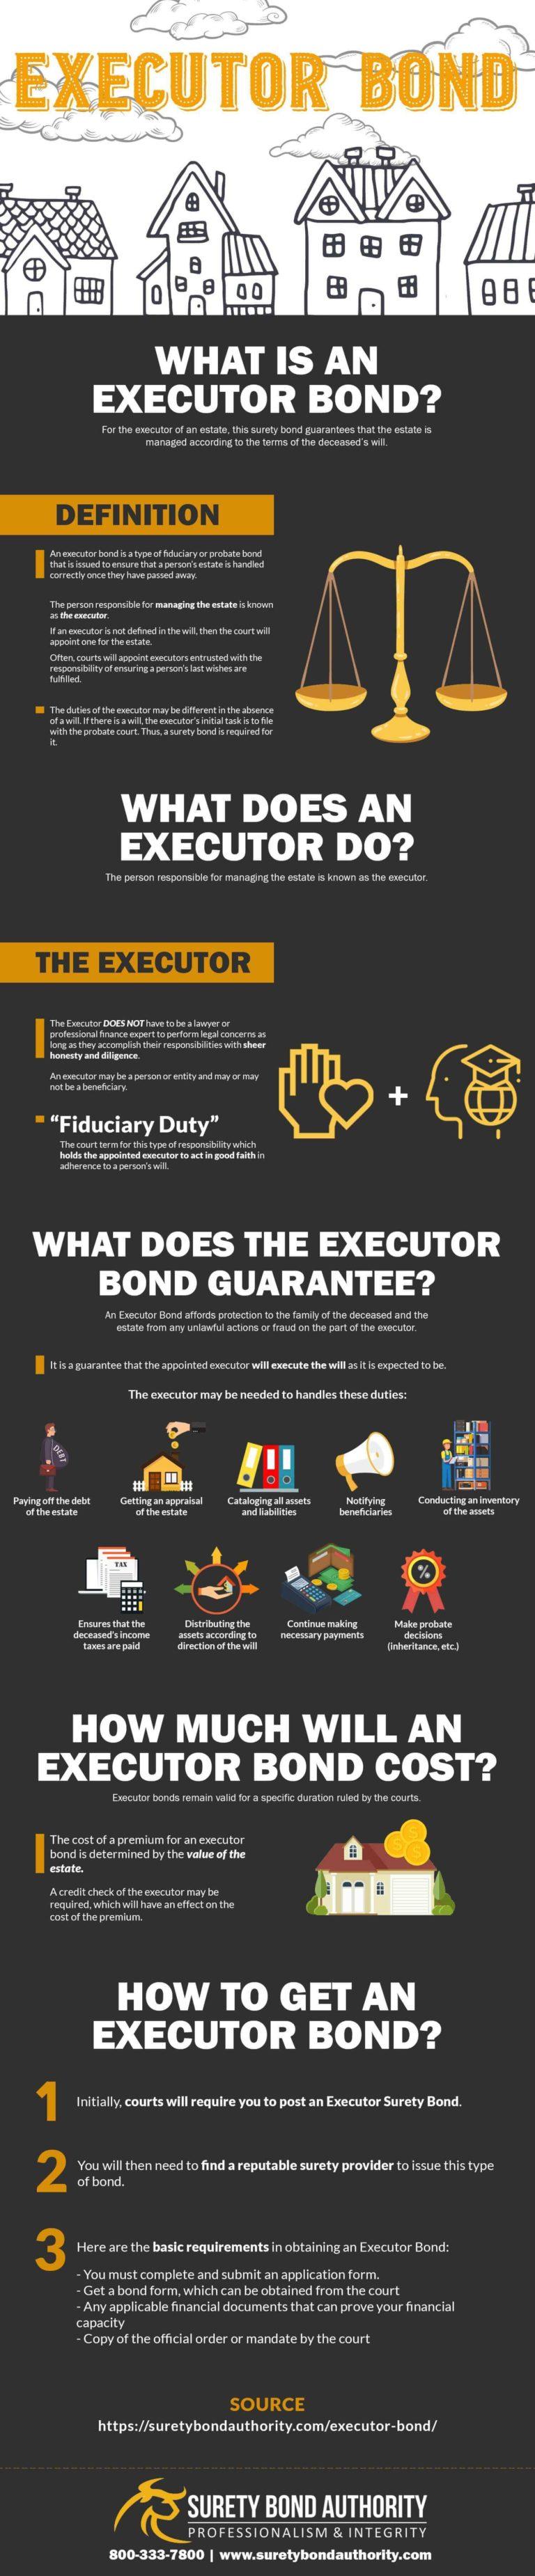 Executor Bond Infographic